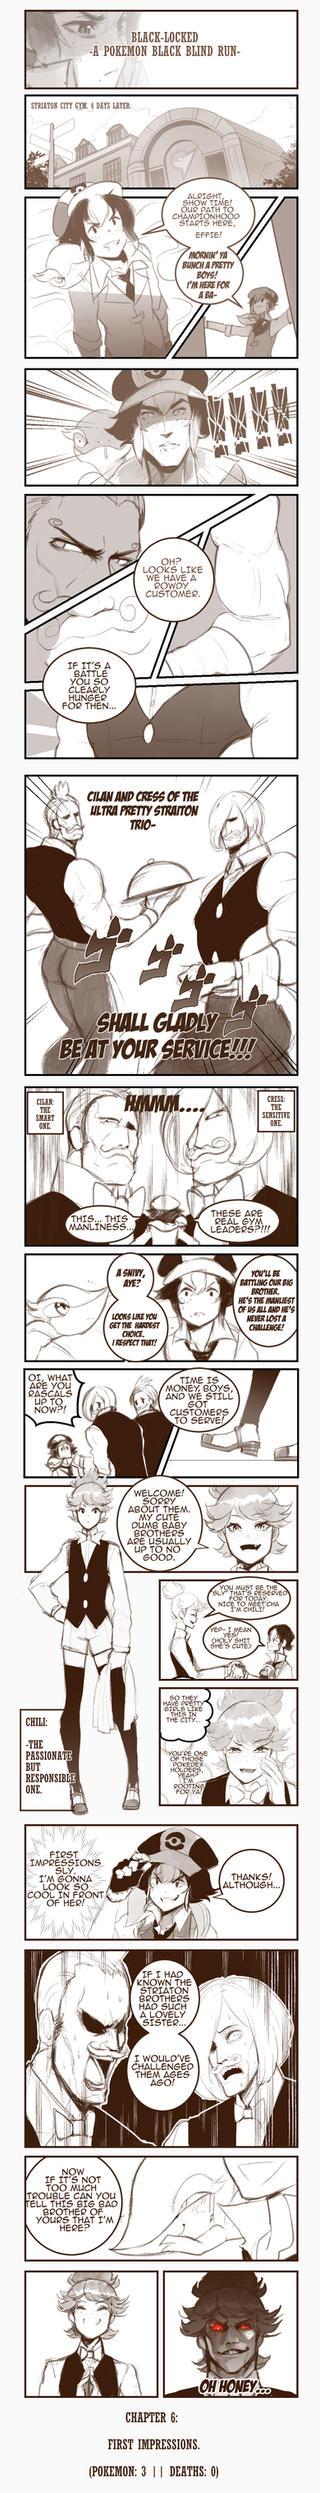 Black-Locked: Page 6 by Billiam-X